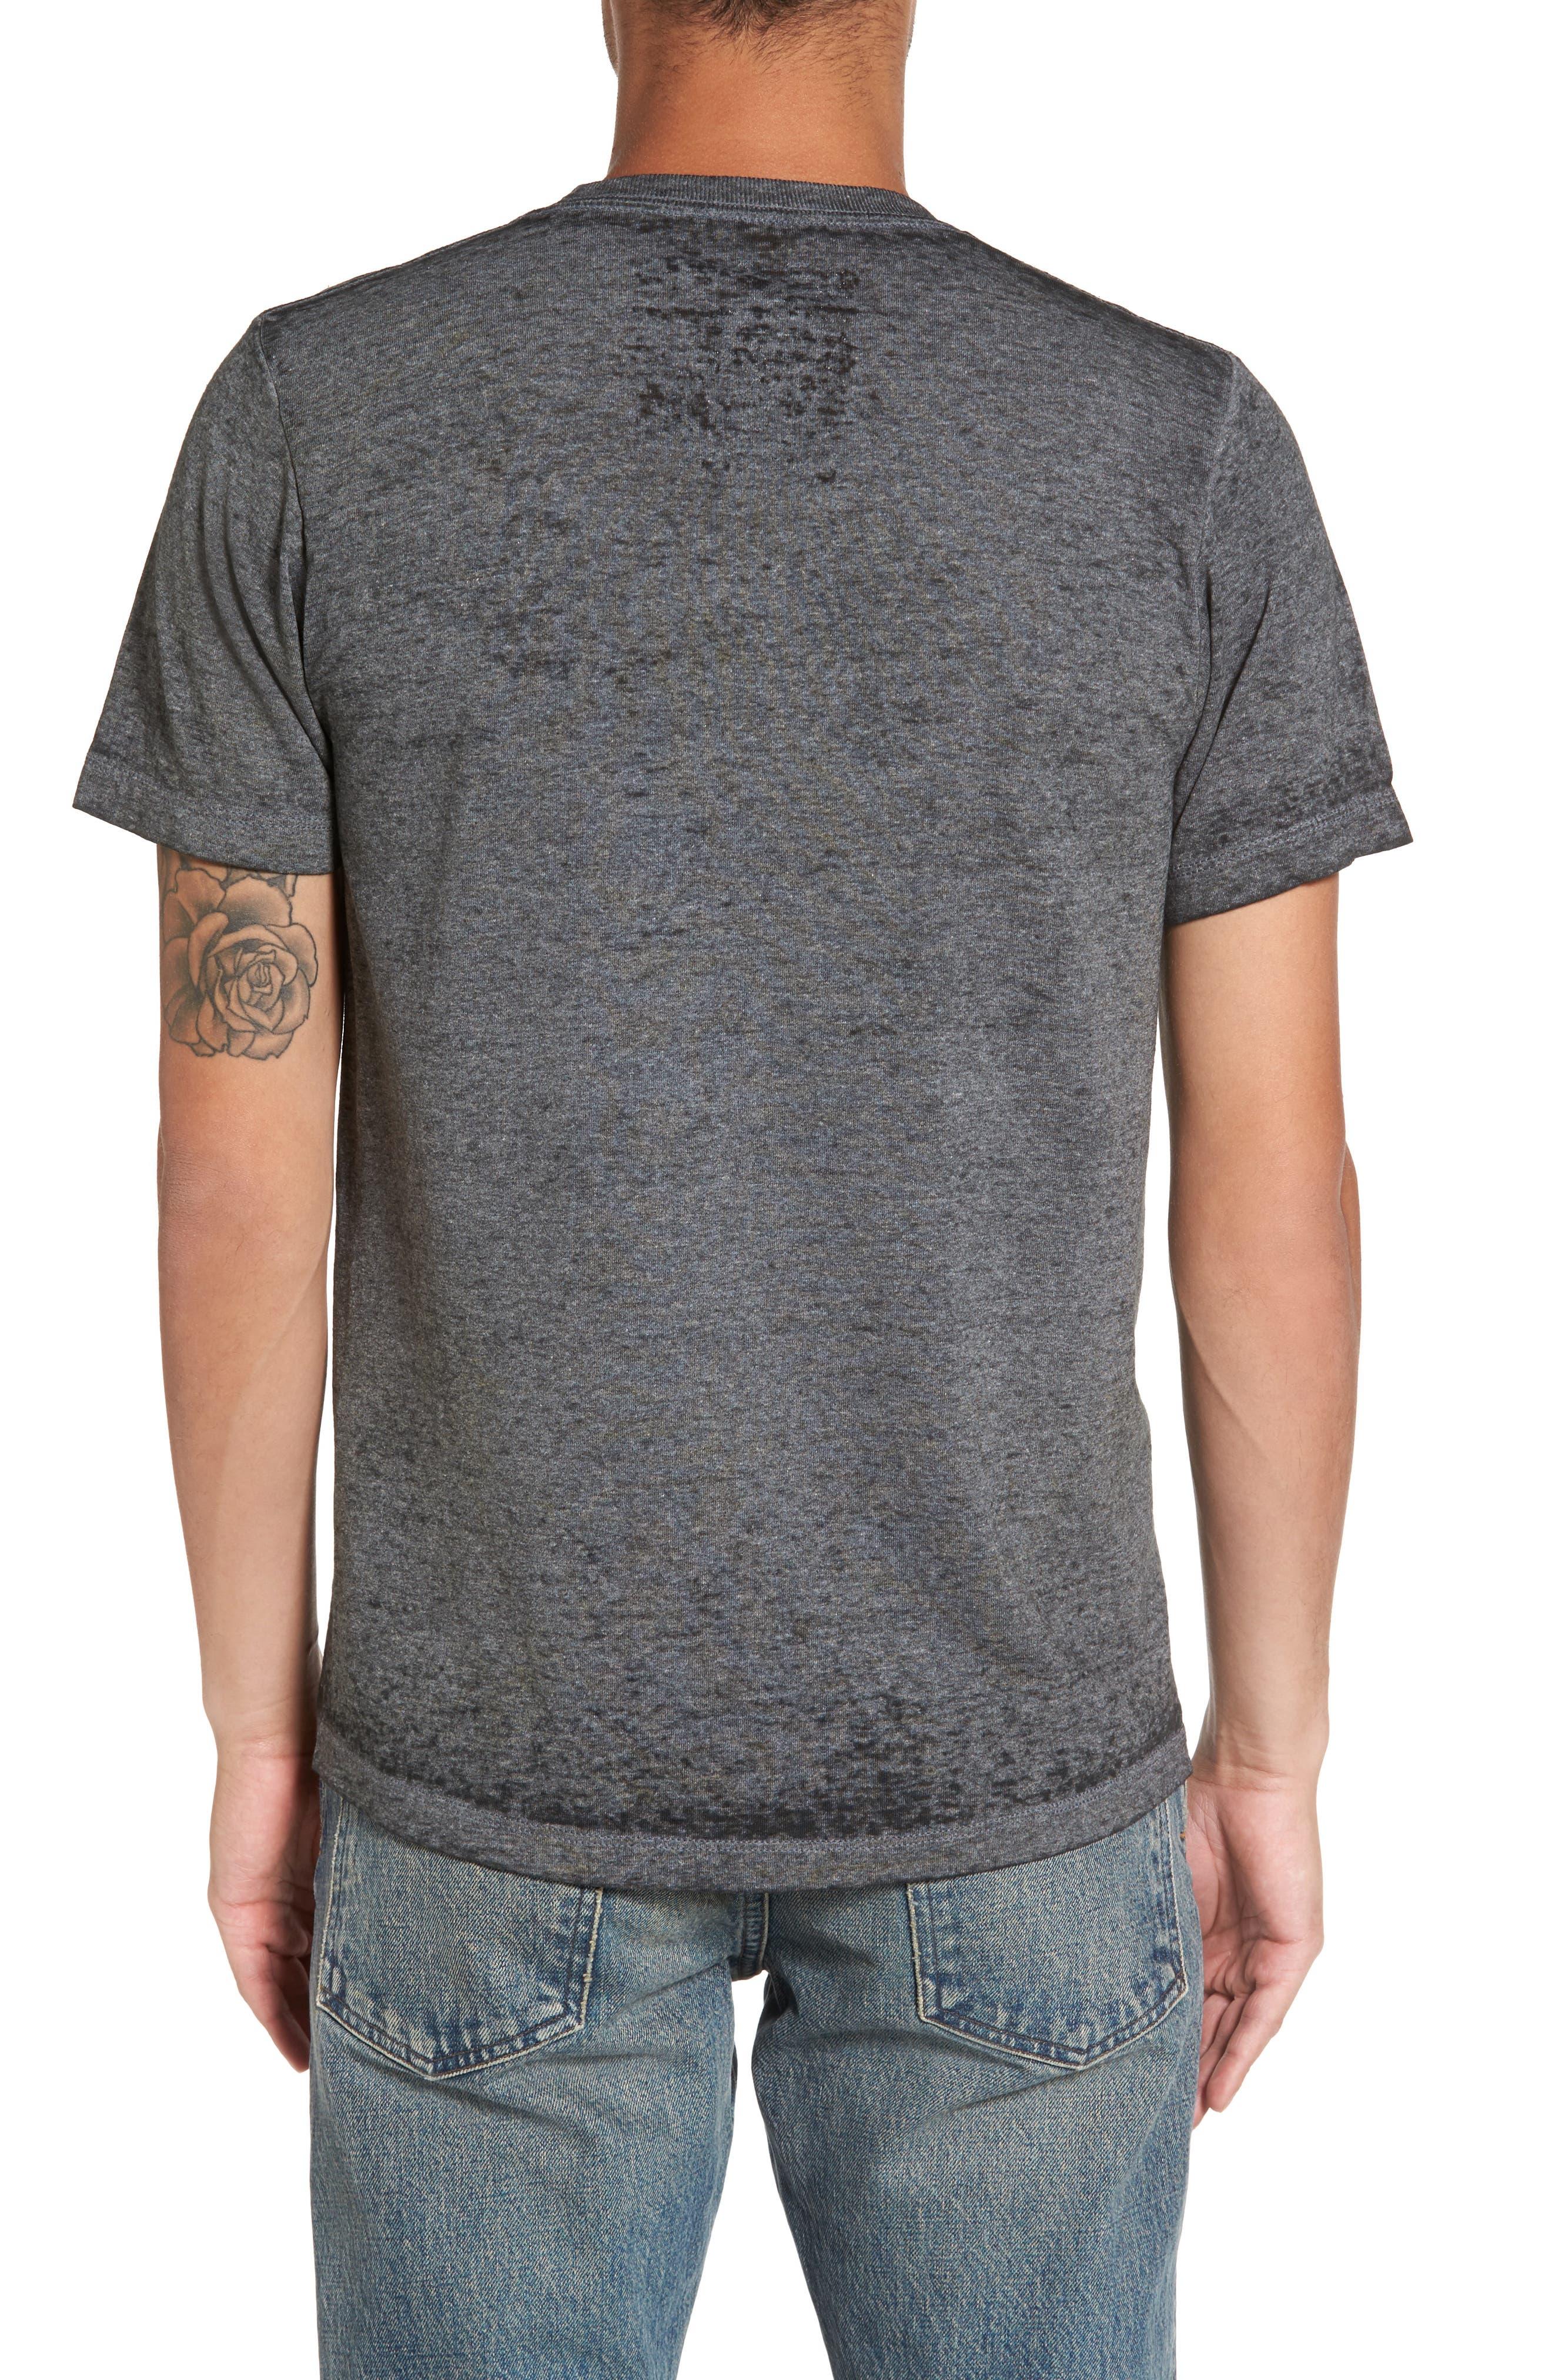 Burnout Graphic T-Shirt,                             Alternate thumbnail 2, color,                             Black The Godfather